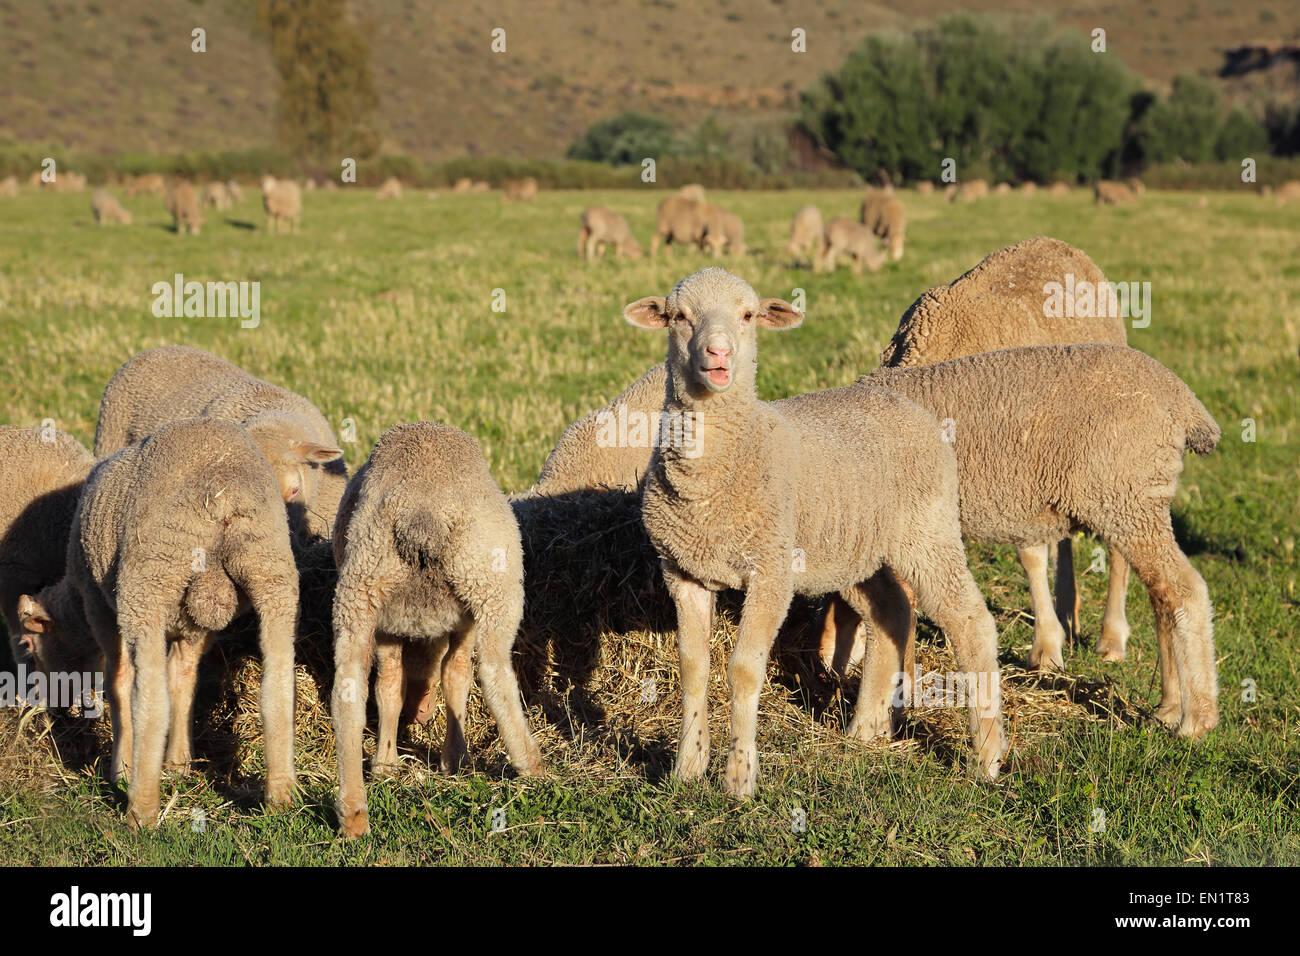 Merino lambs grazing on green pasture, Karoo region, South Africa - Stock Image